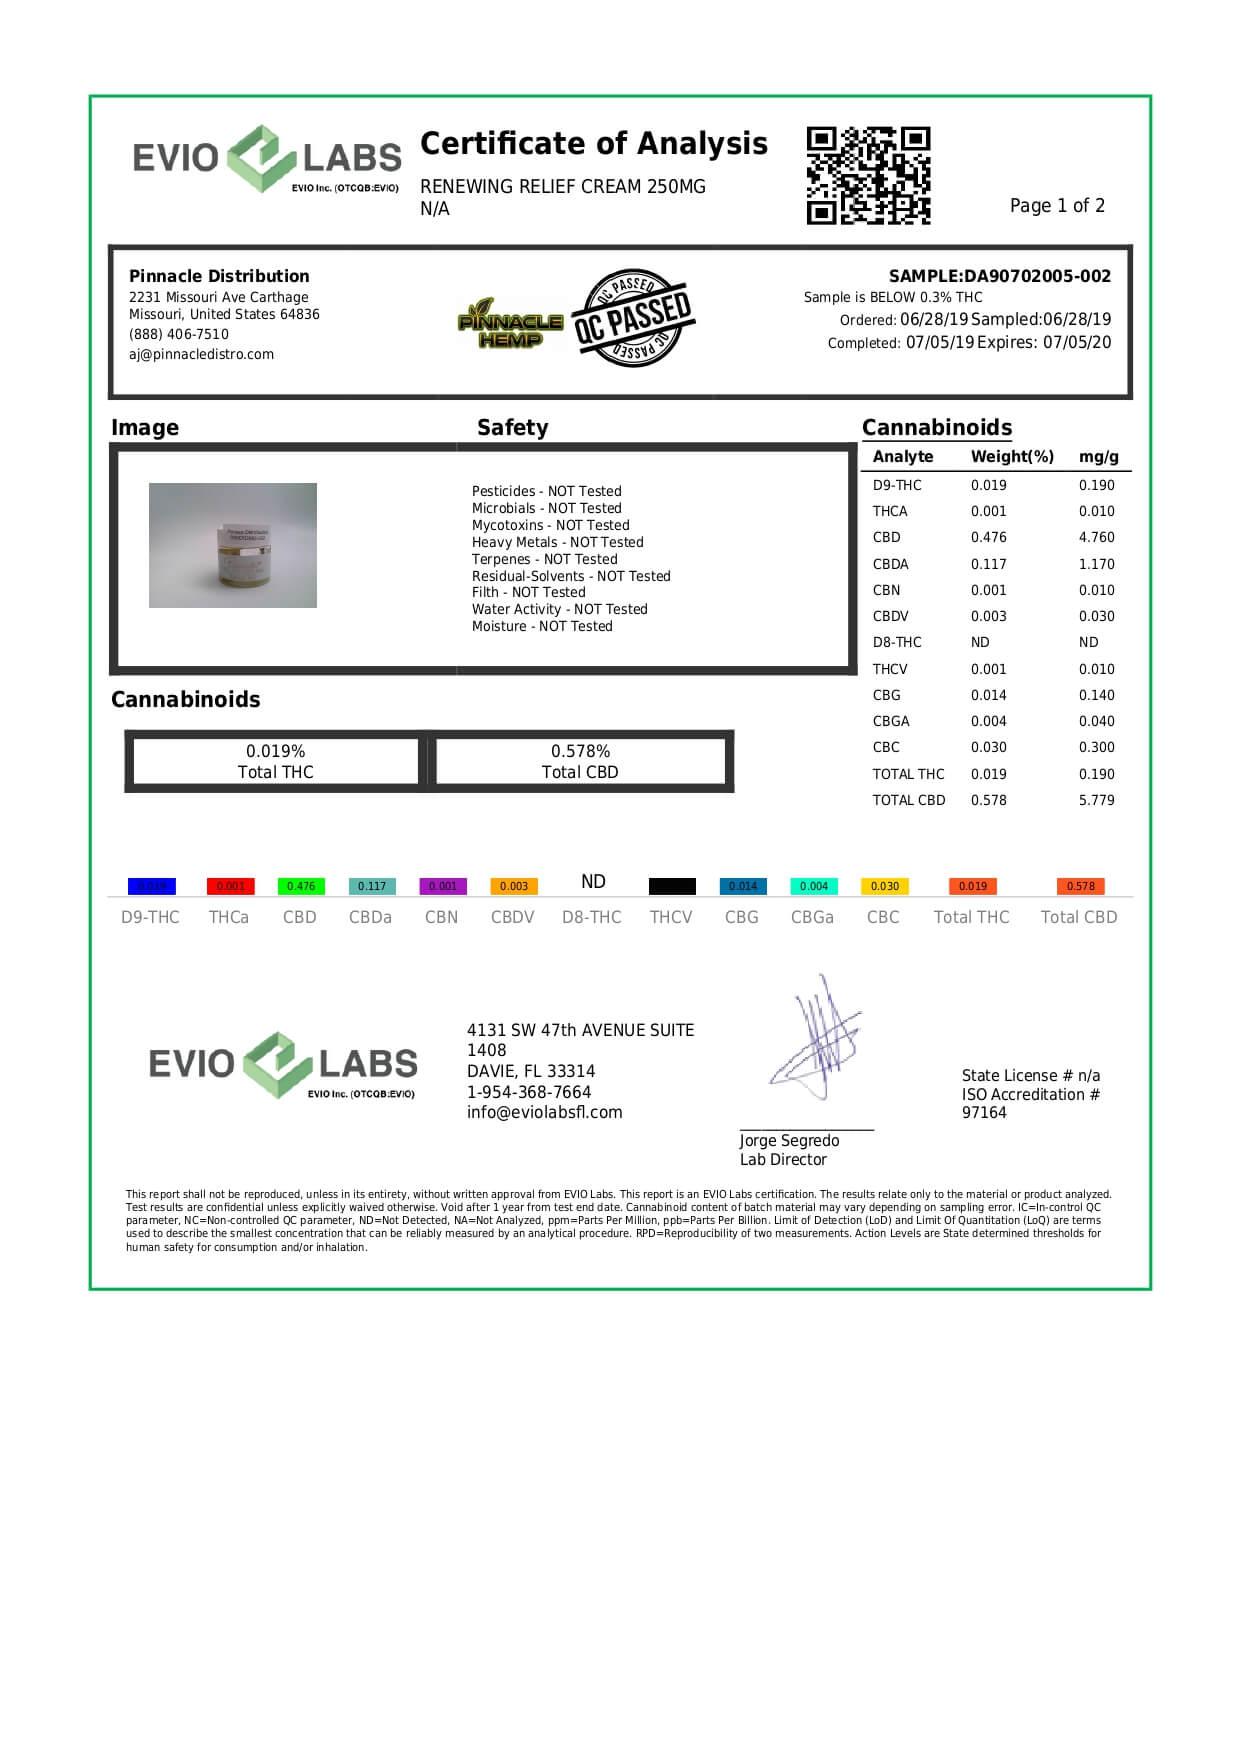 Pinnacle Hemp CBD Topical Relief Cream Renewing 250mg Lab Report